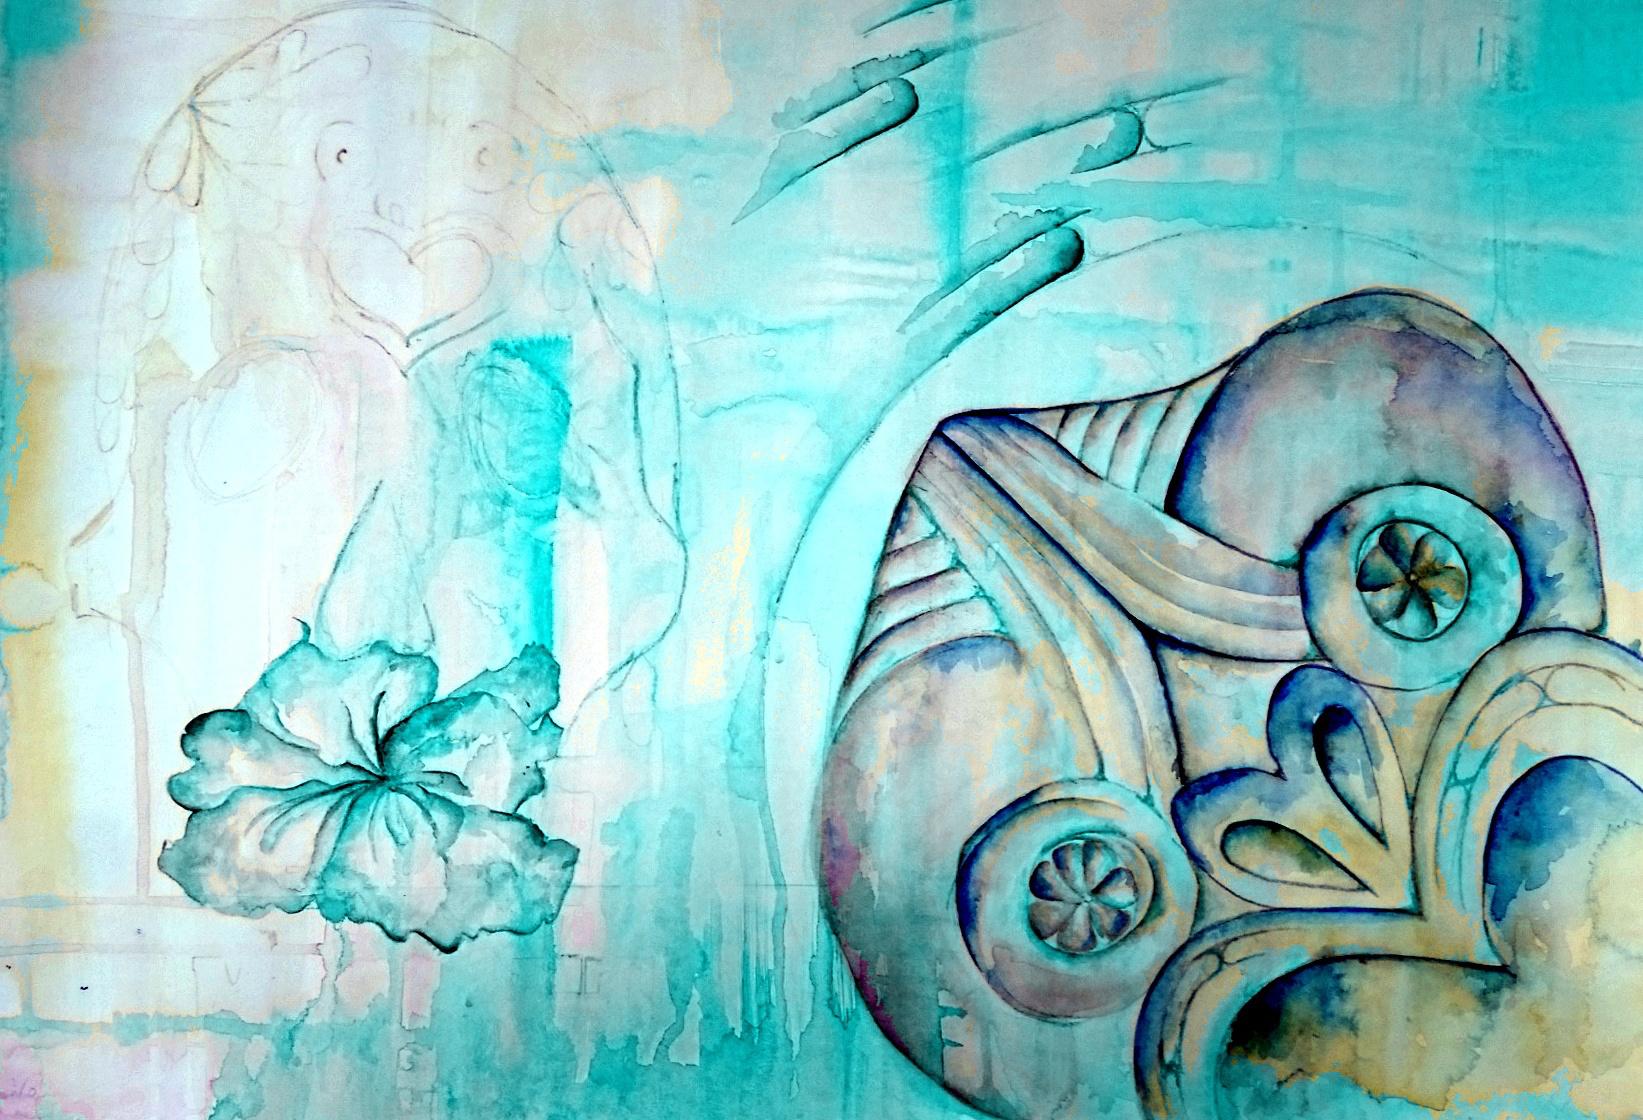 'Mokomokai' by Hayley Galo